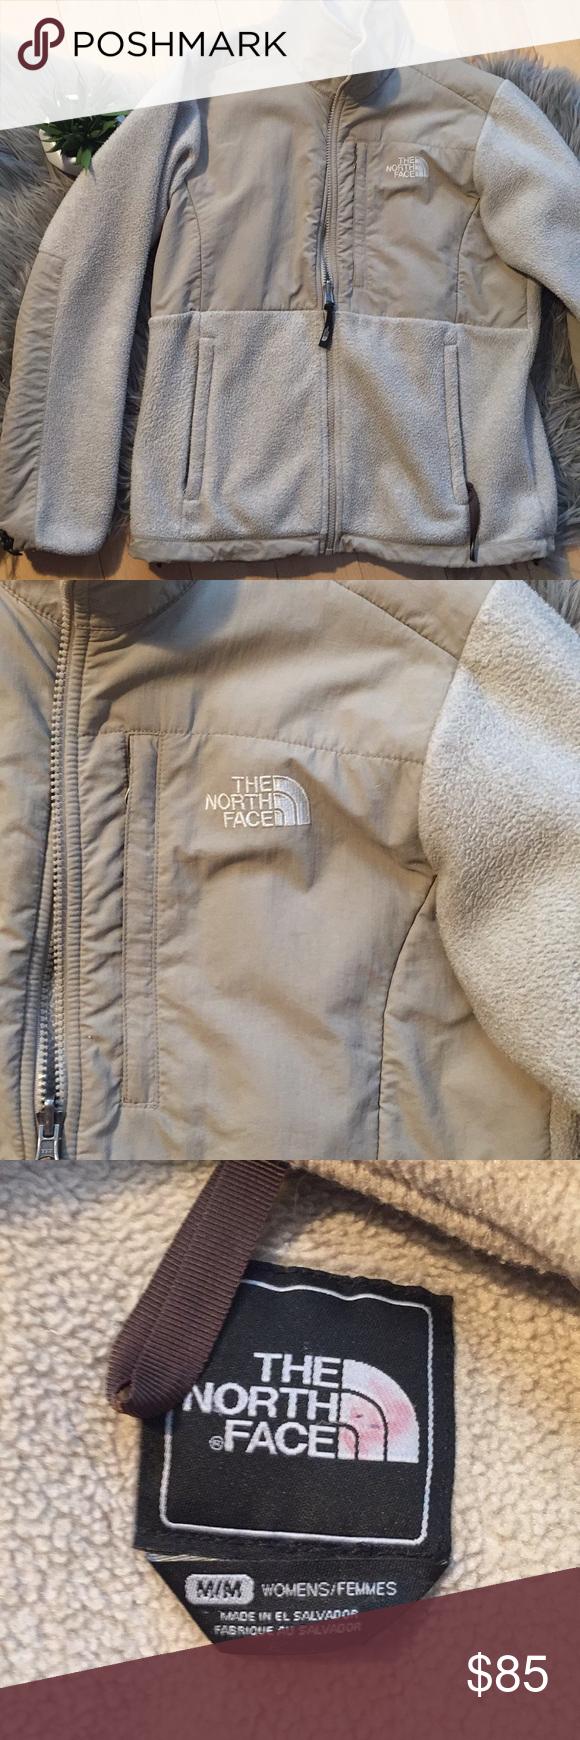 North Face Denali Jacket In Tan The North Face Jackets North Face Jacket [ 1740 x 580 Pixel ]